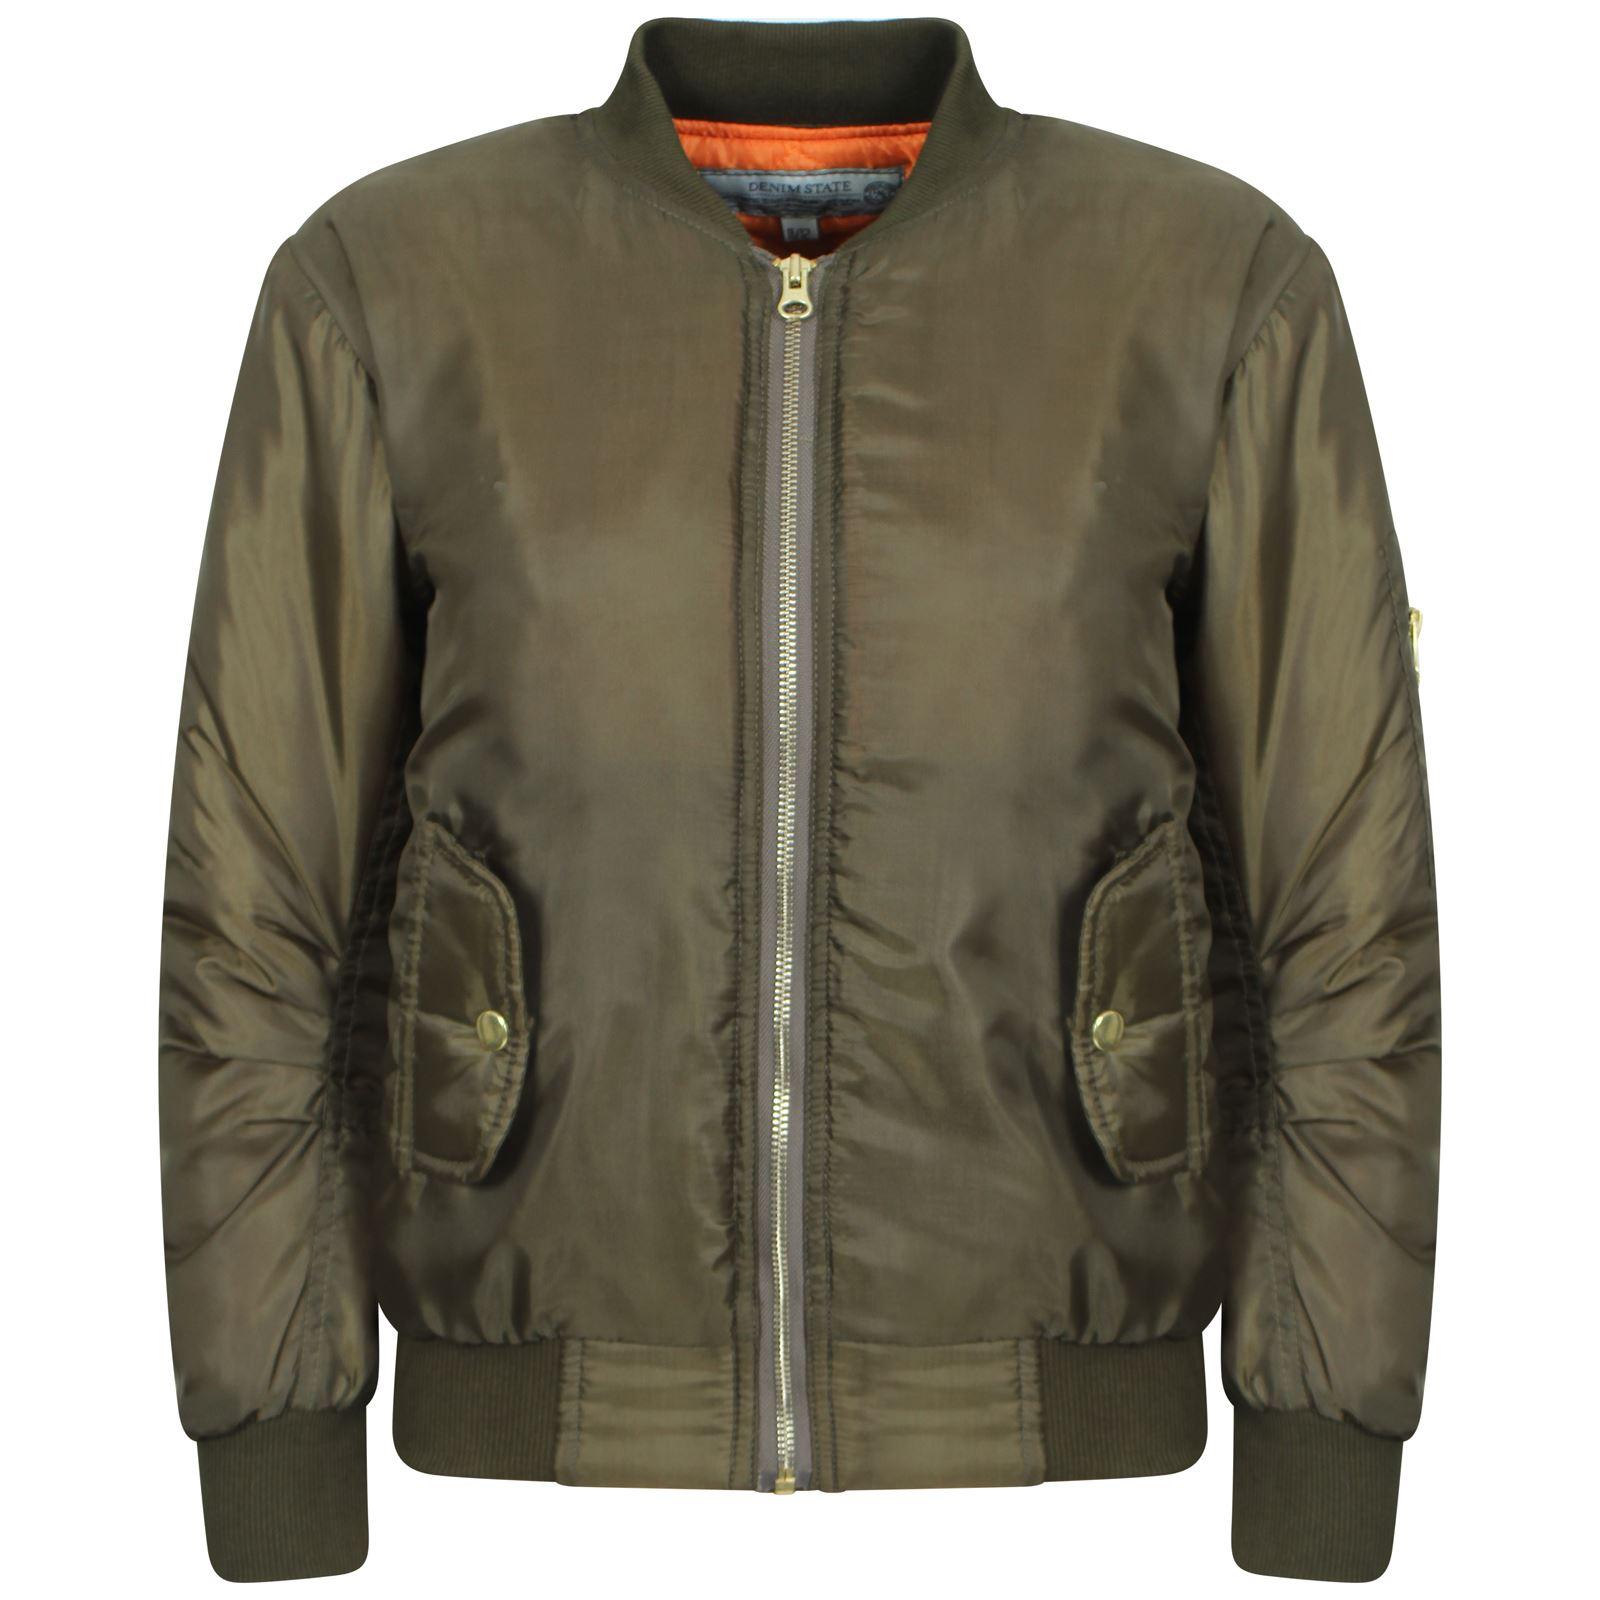 New Boys Girls Kids Winter Jacket Biker Bomber Pilot Warm Padded Air Style Coat